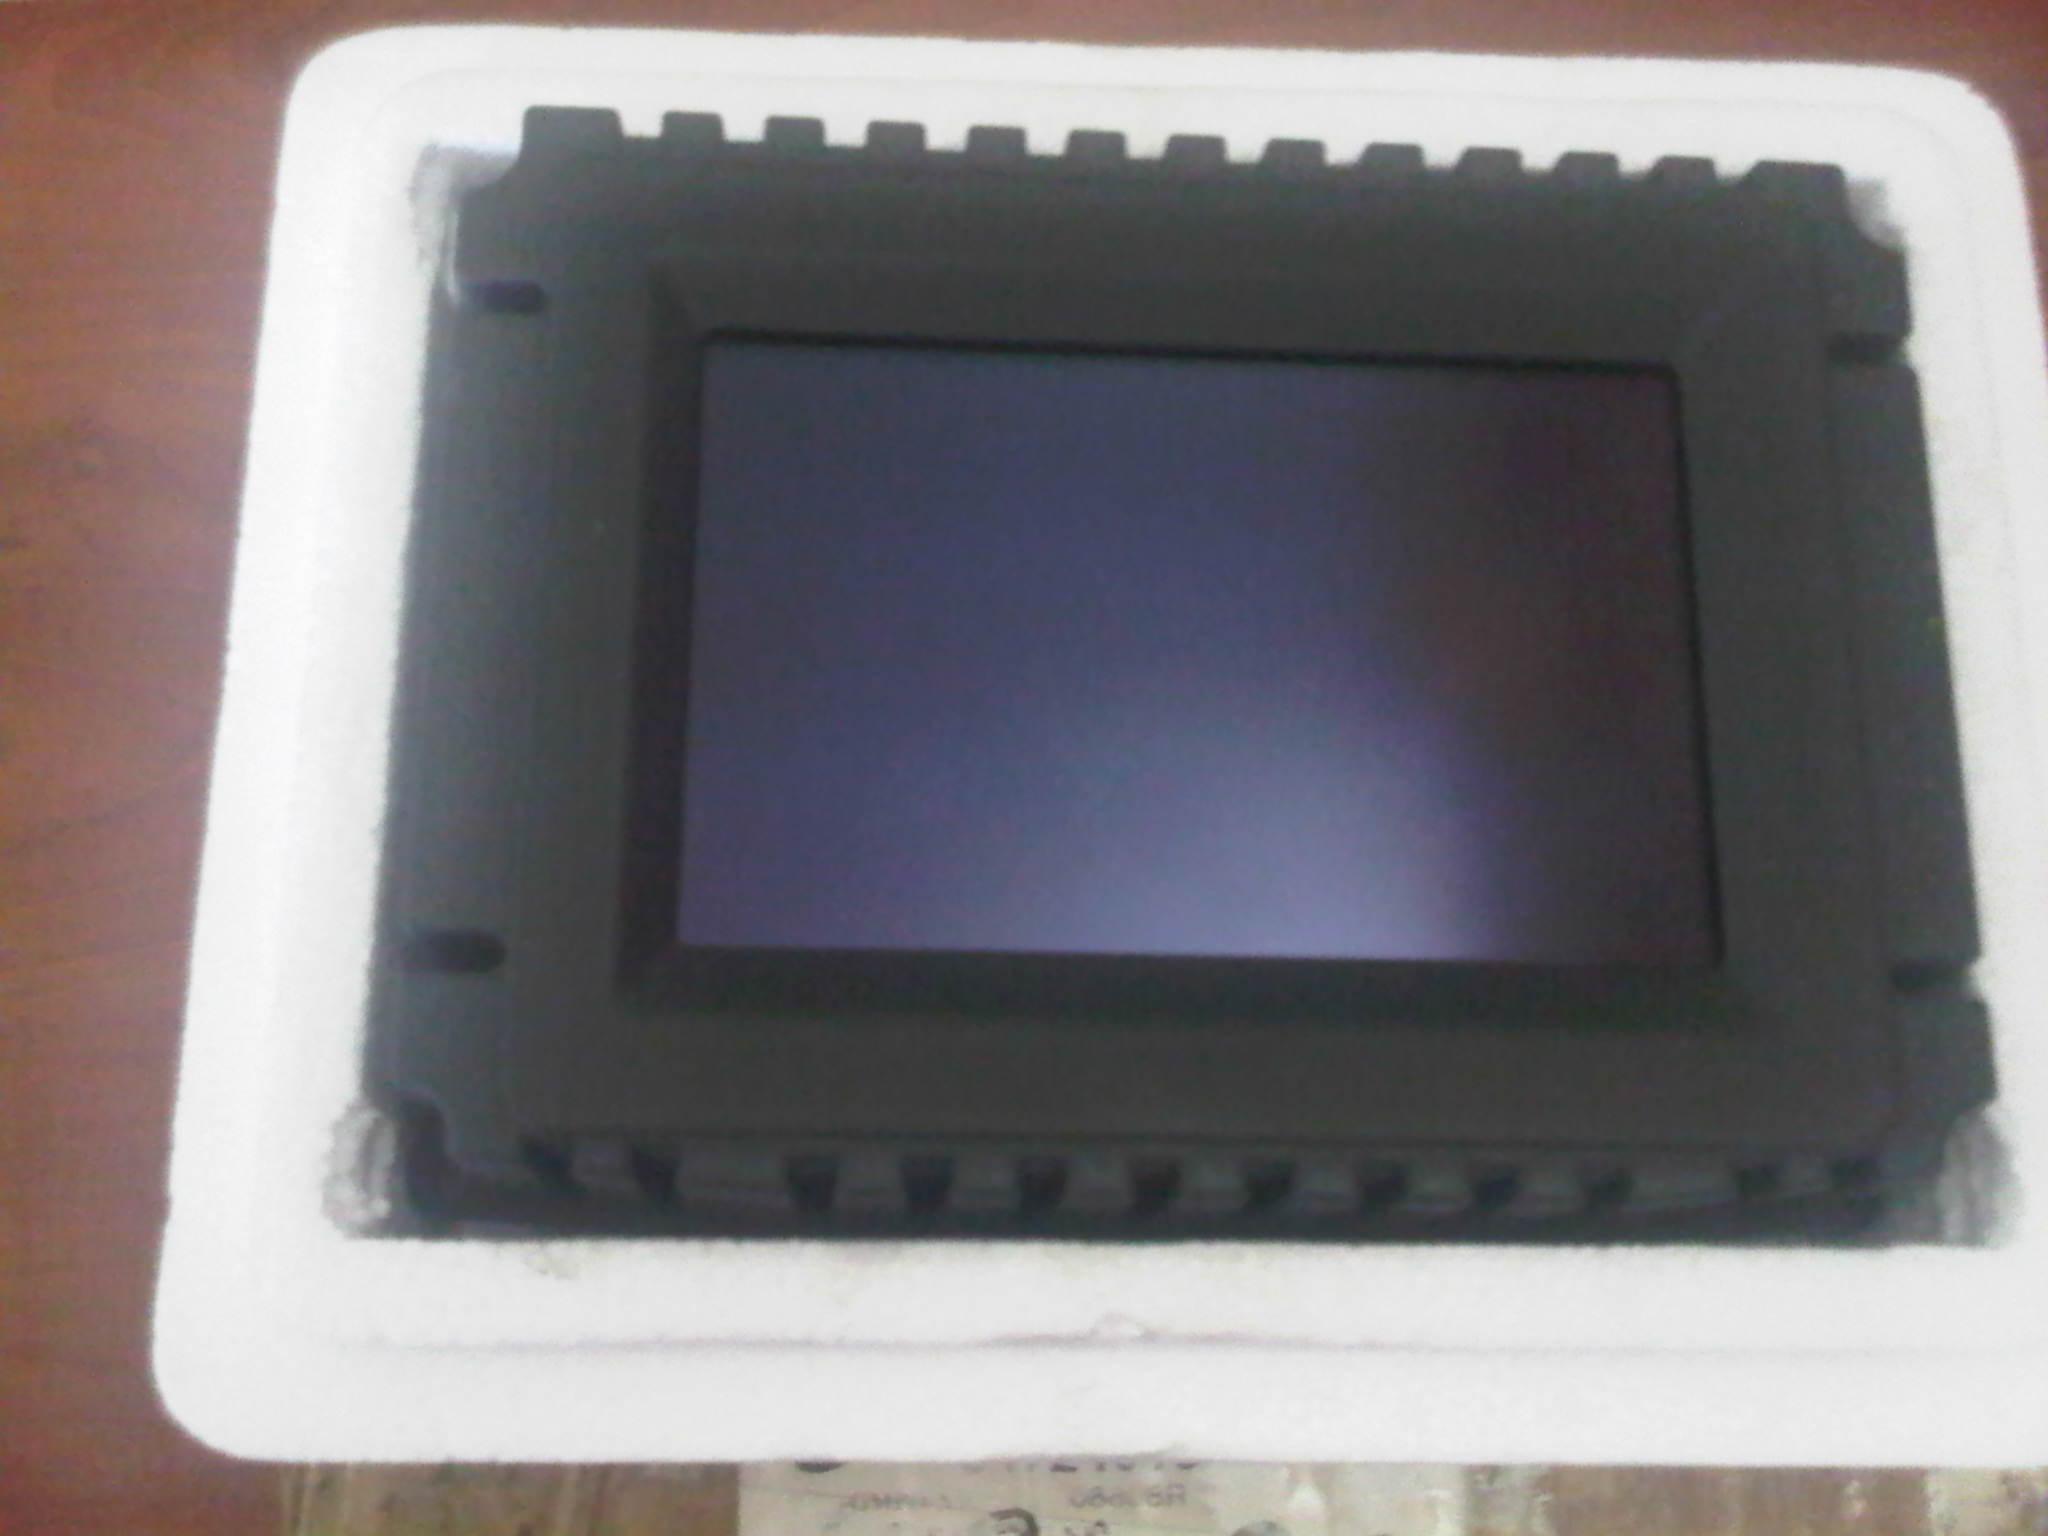 OPEL VECTRA C BOARD COMPUTER ÇOK FONKSİYONLU 6236473  6236480 6236495  6236463